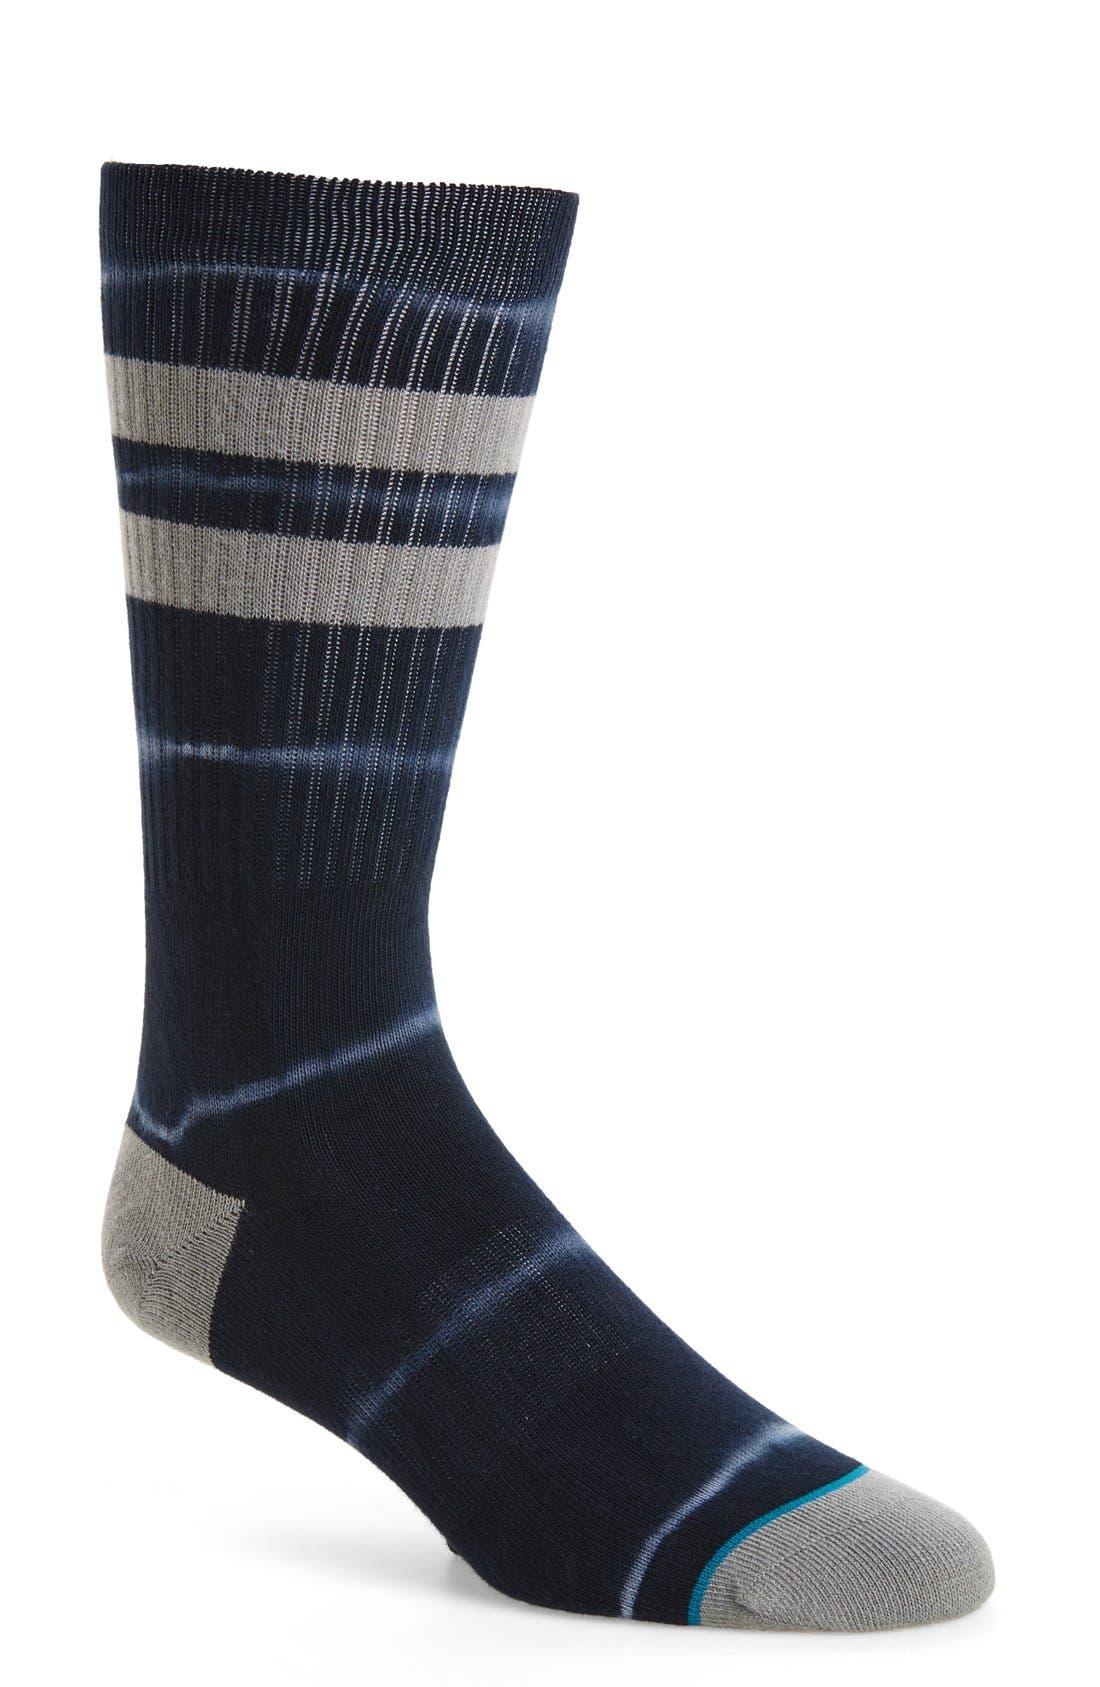 Stance 6AM Classic Crew Socks